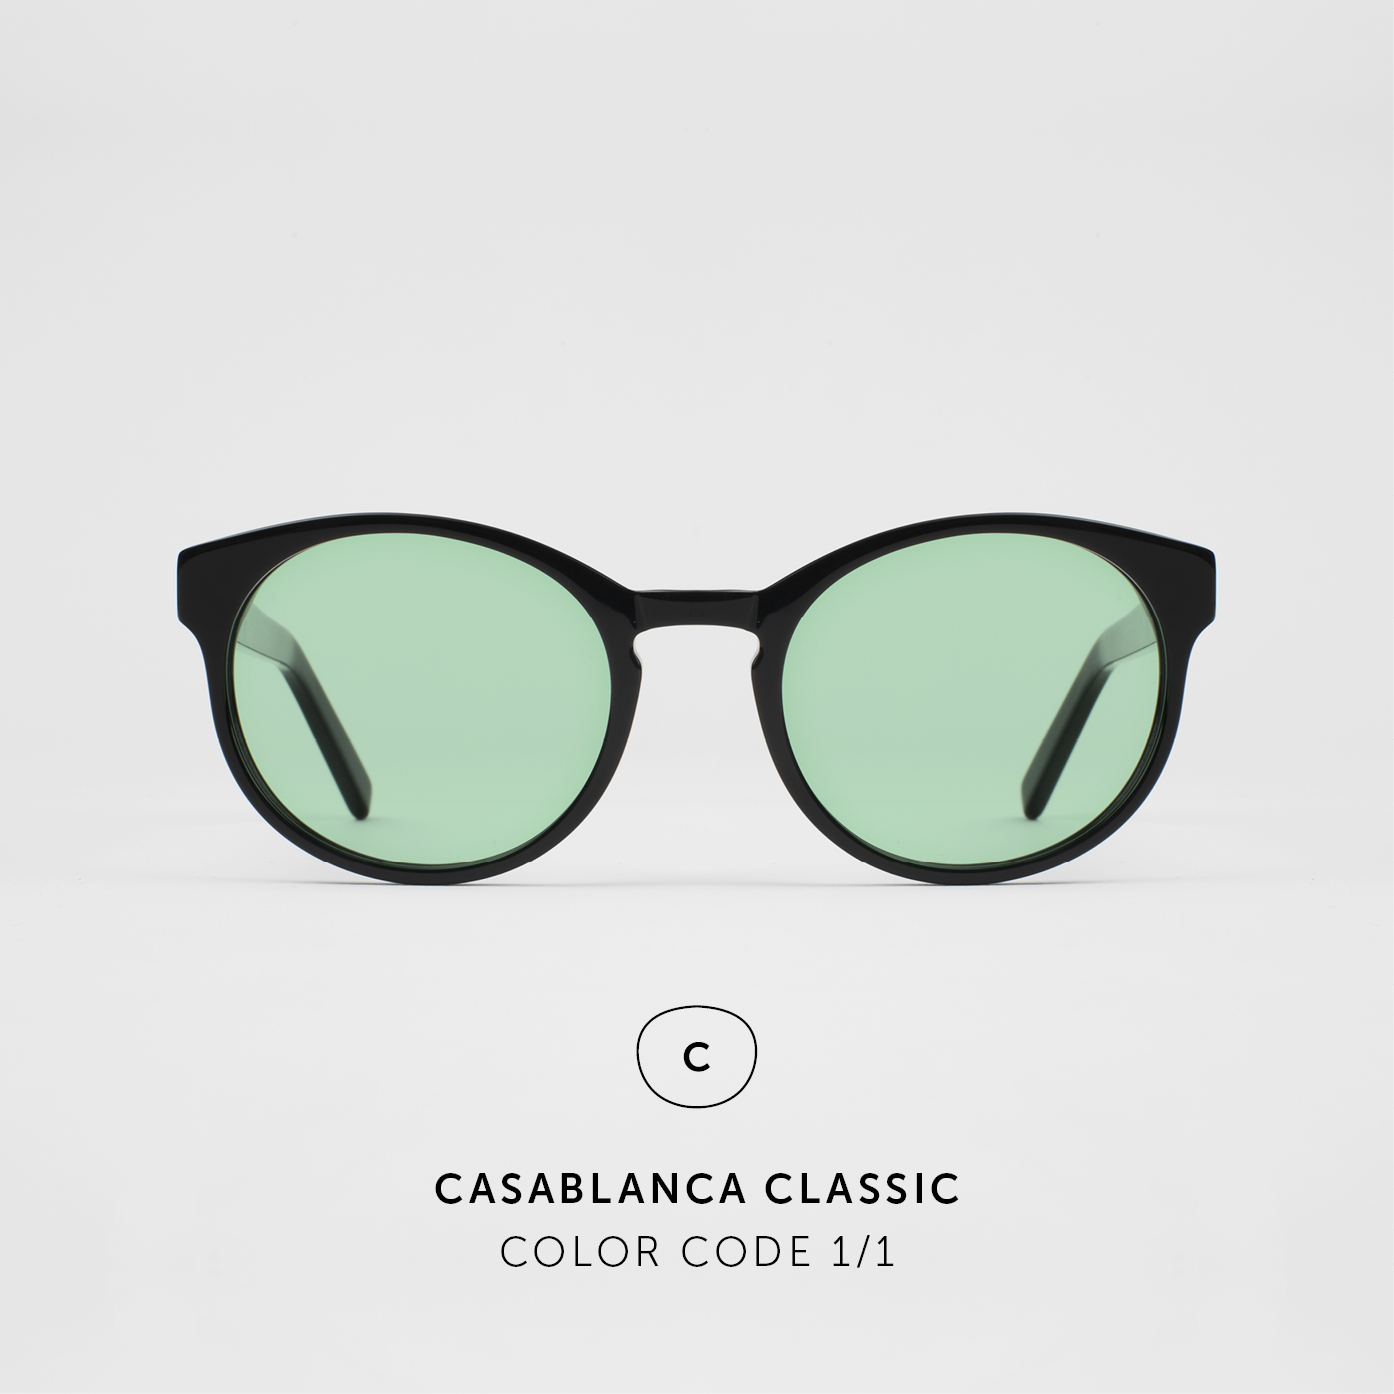 CasablancaClassic4.jpg